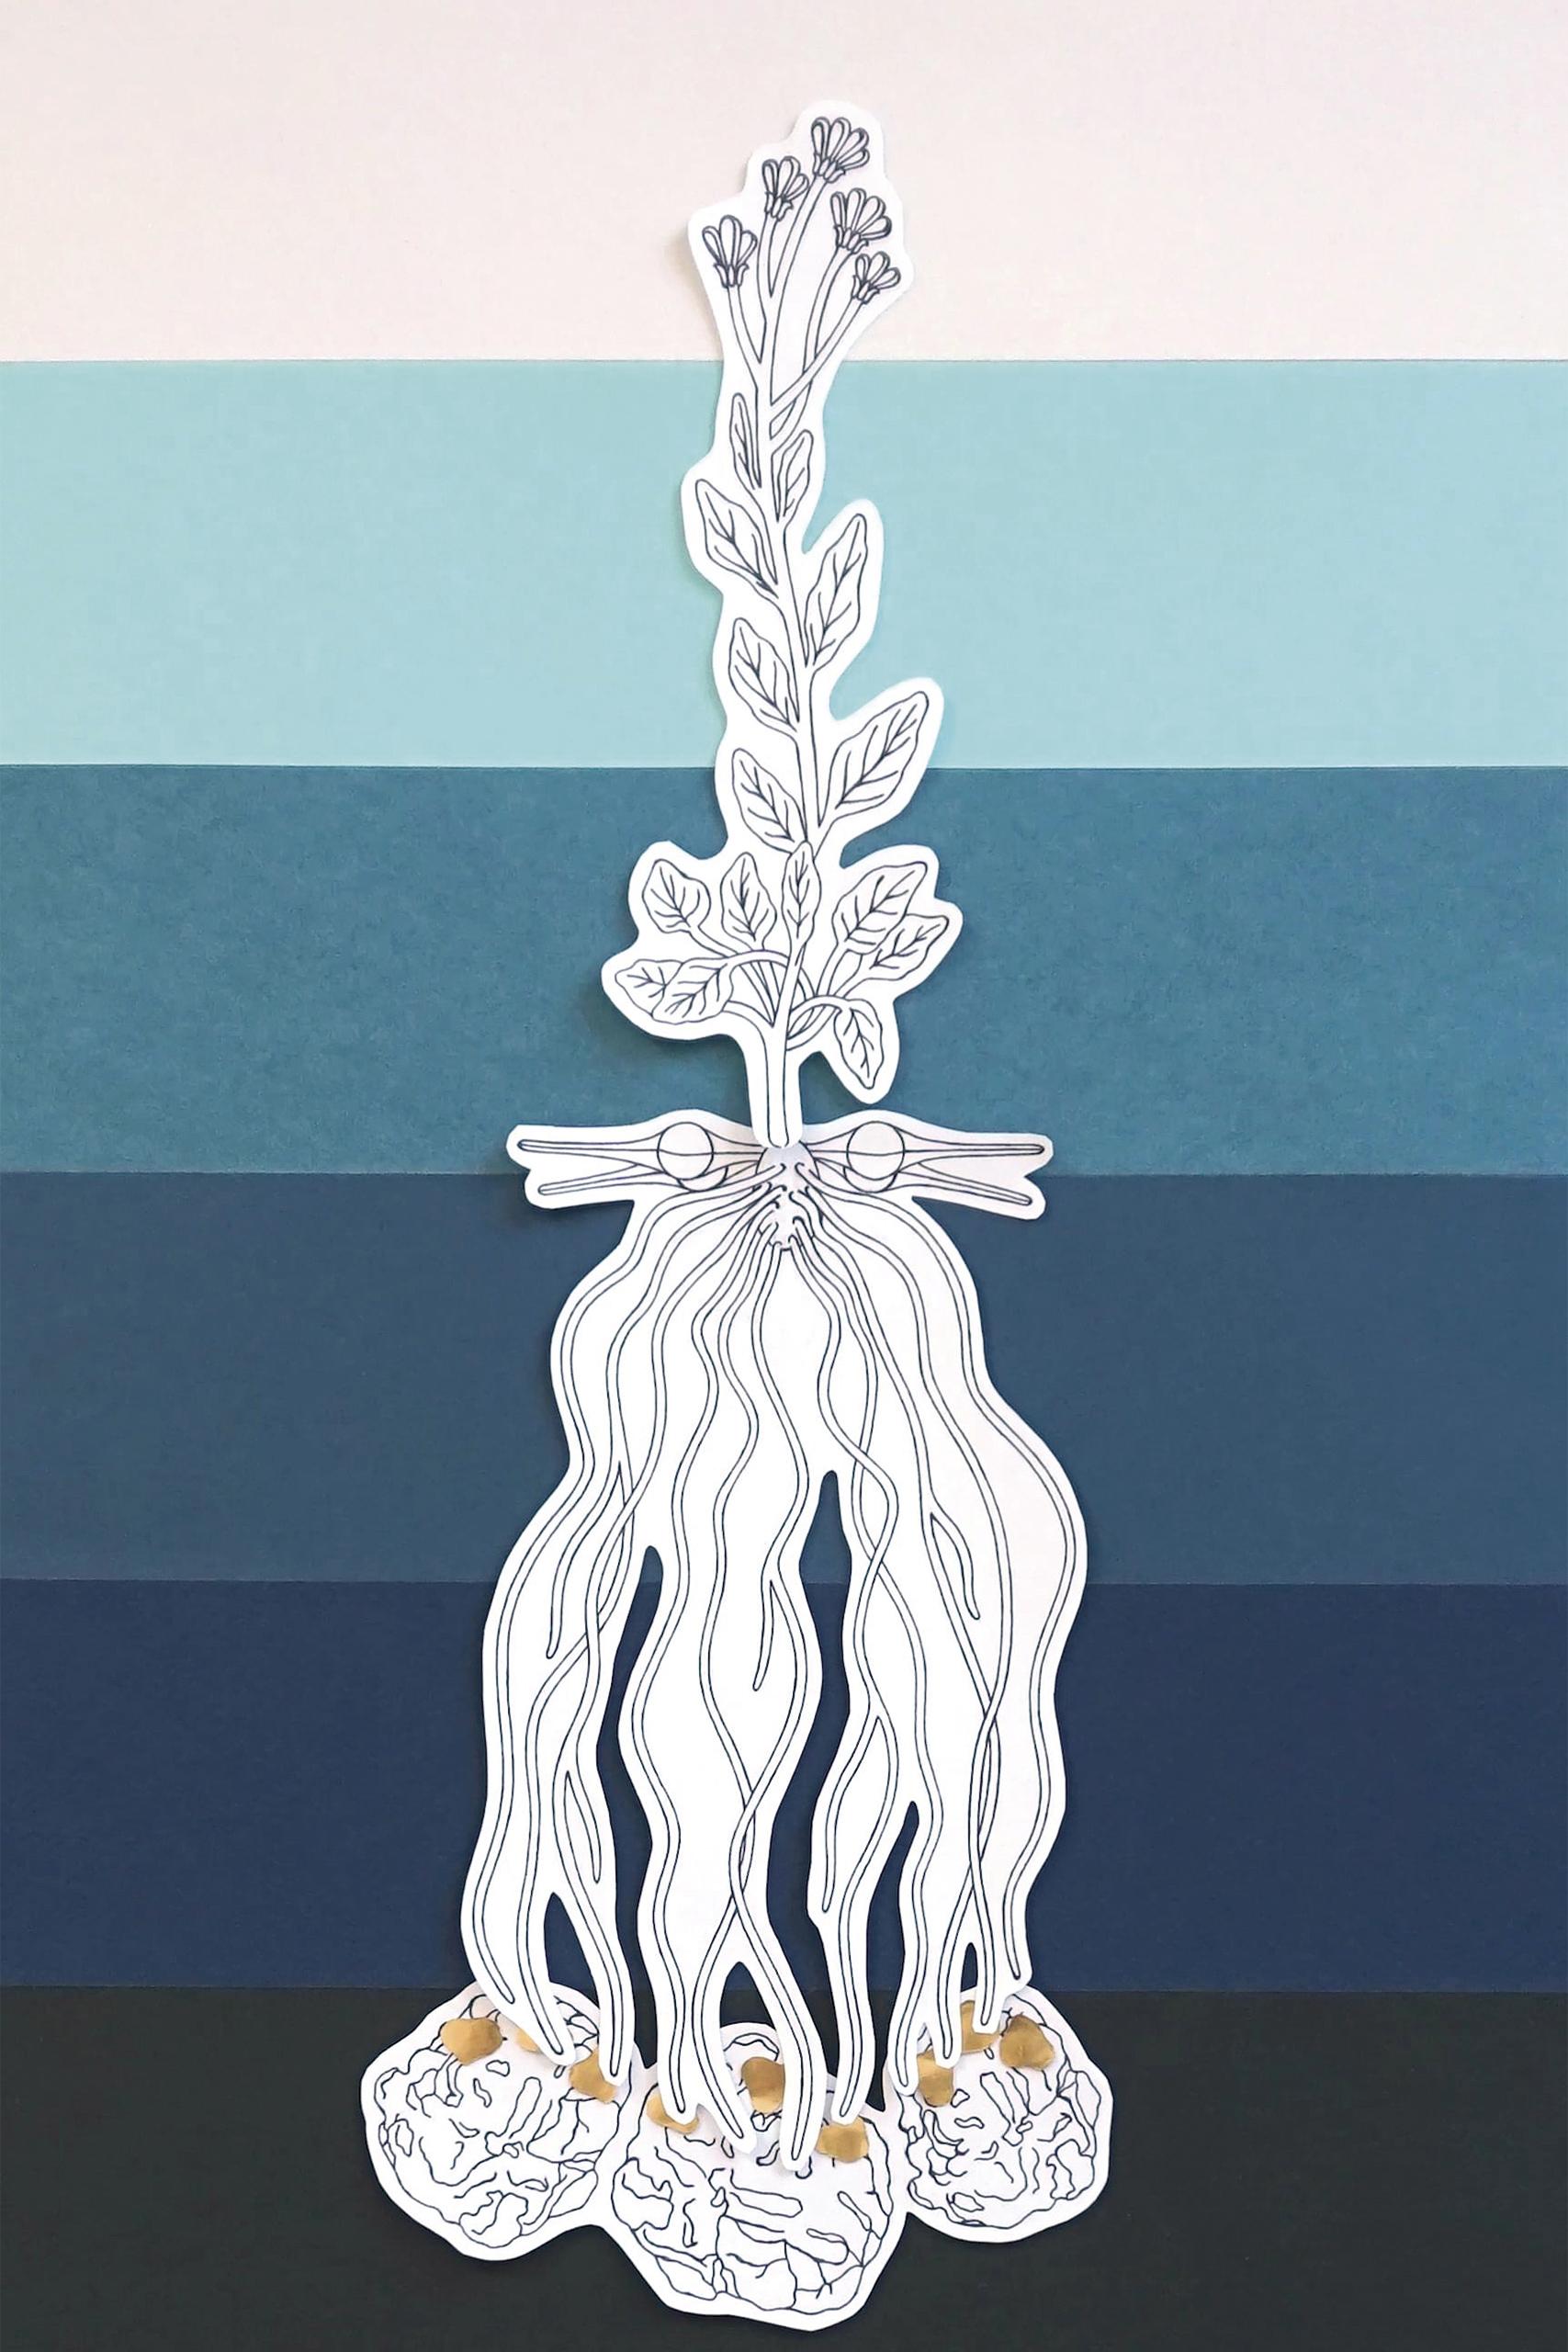 Illustration: Annalena Manz